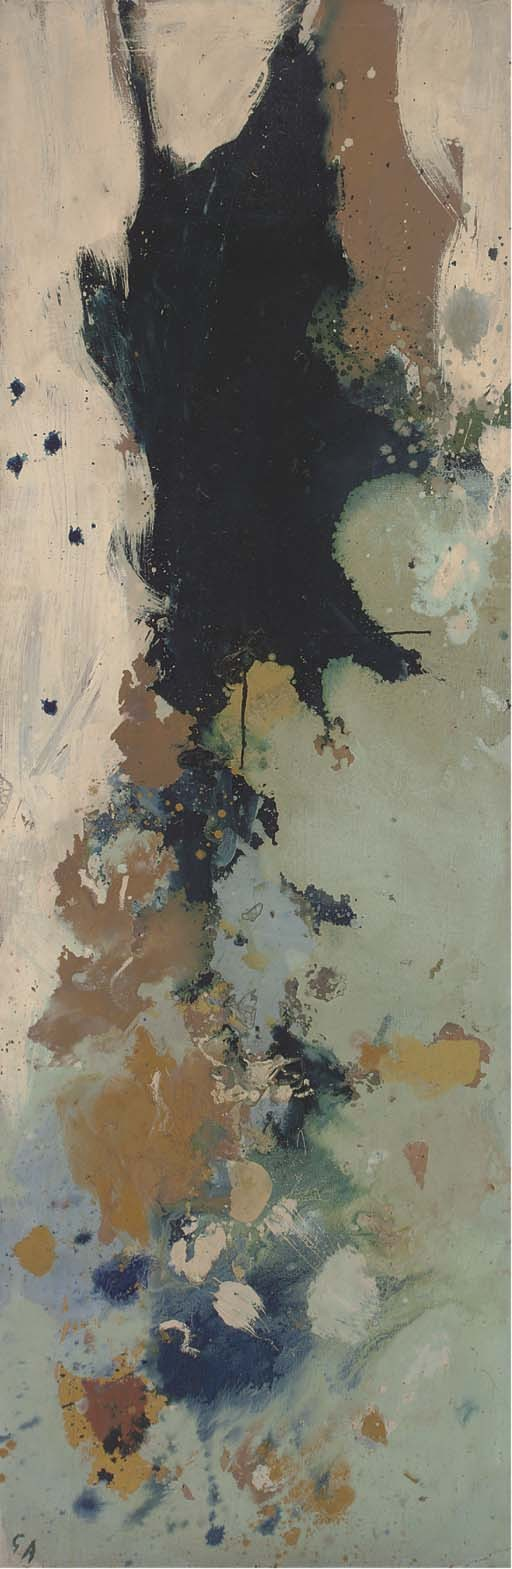 Gillian Ayres, R.A. (B.1930)